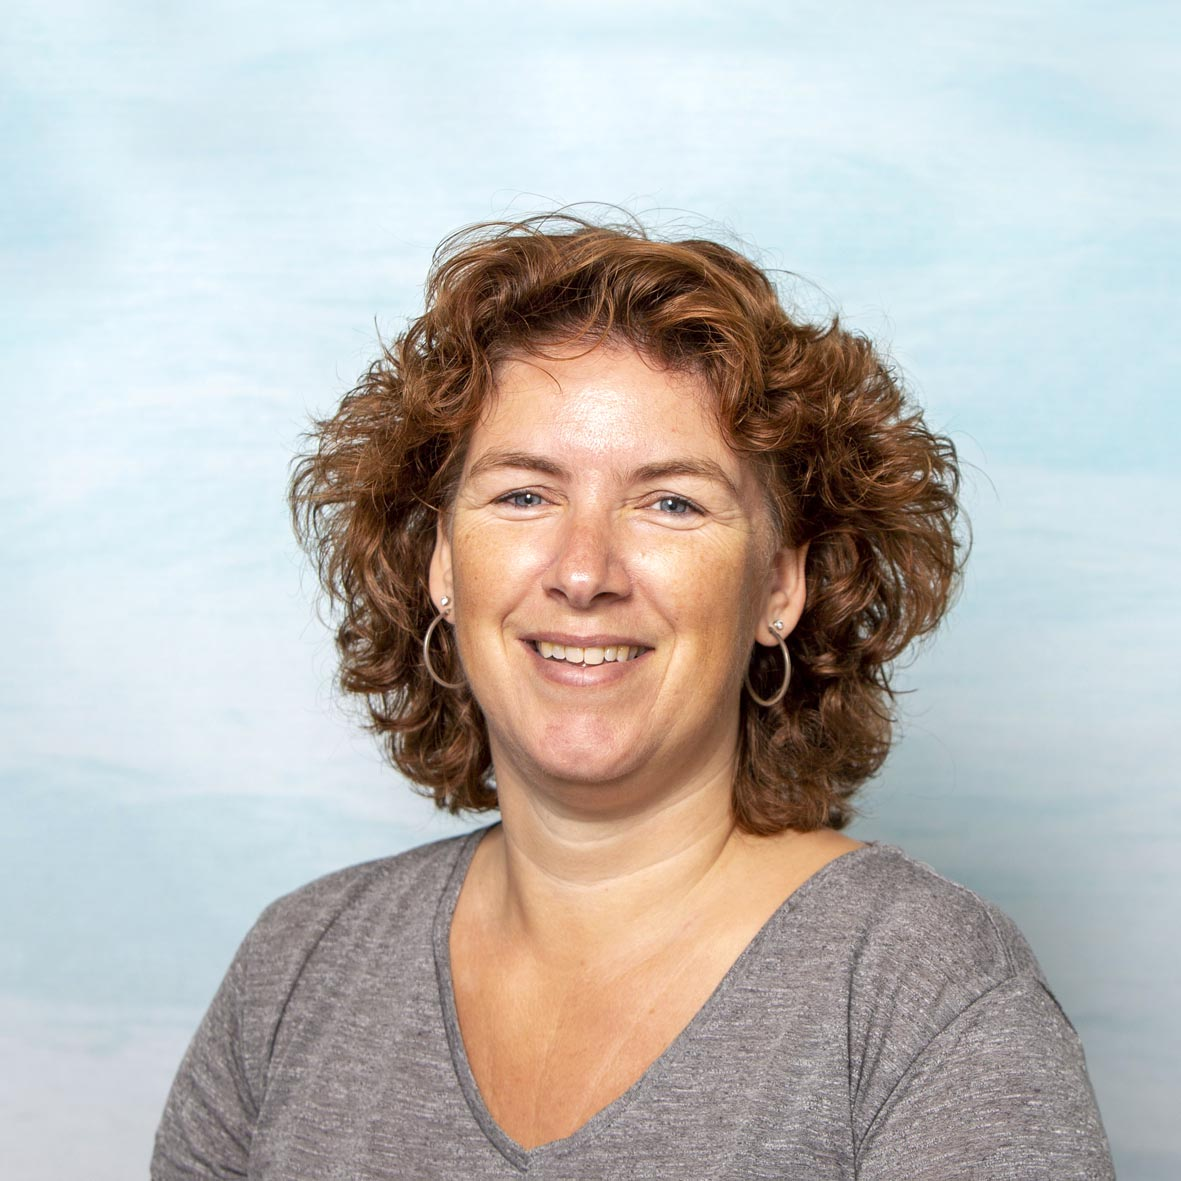 Sandra Zevenbergen